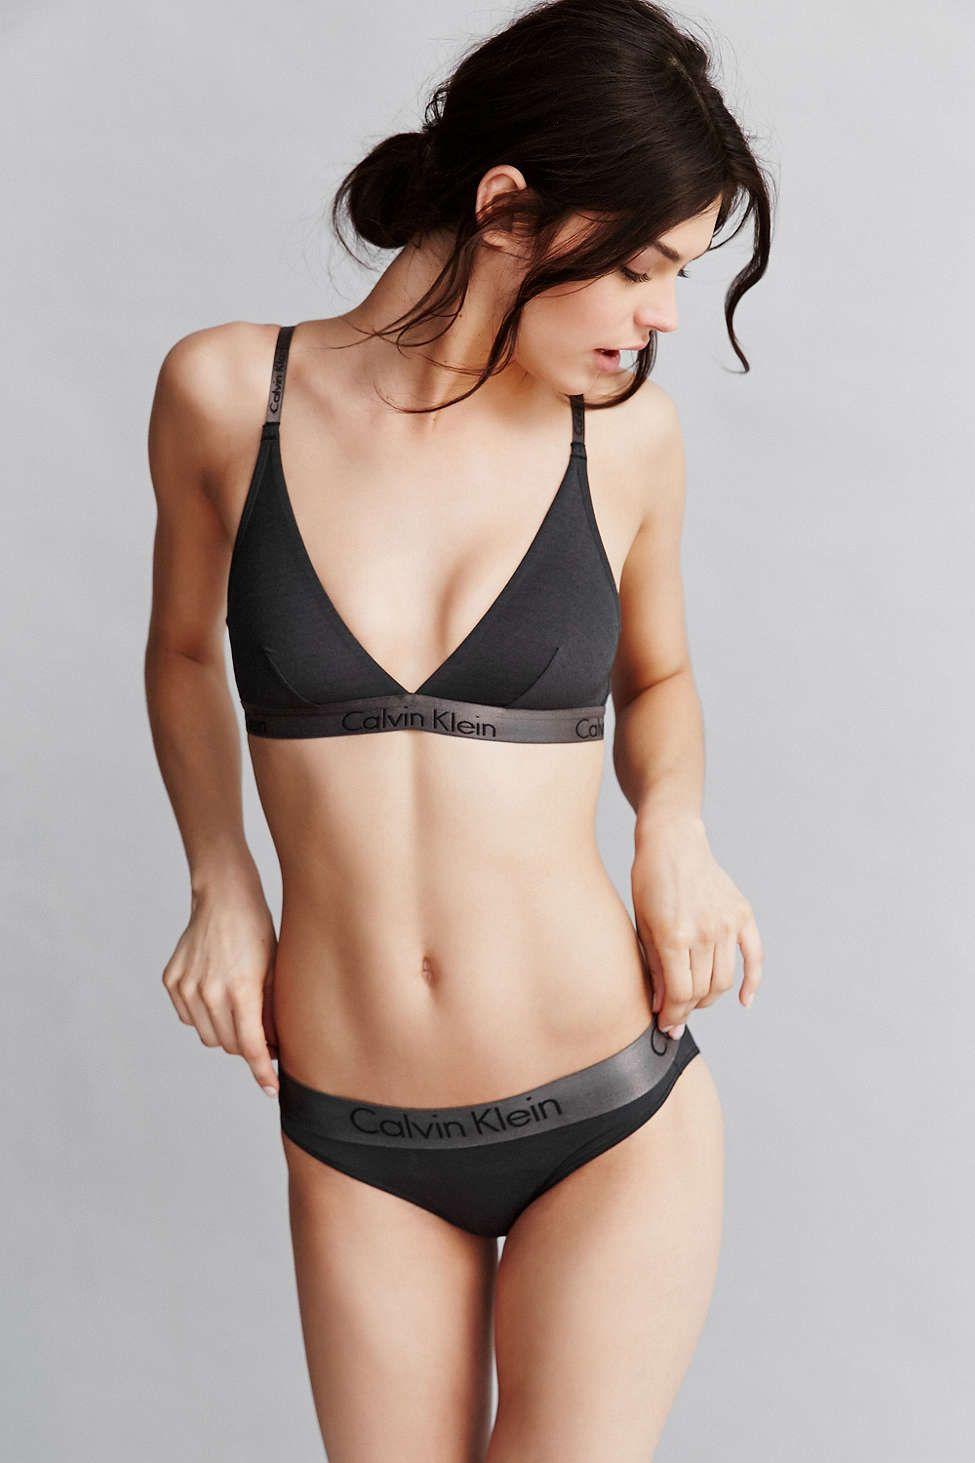 948cb3ae0aeea Calvin Klein Dual Tone Bikini - Urban Outfitters